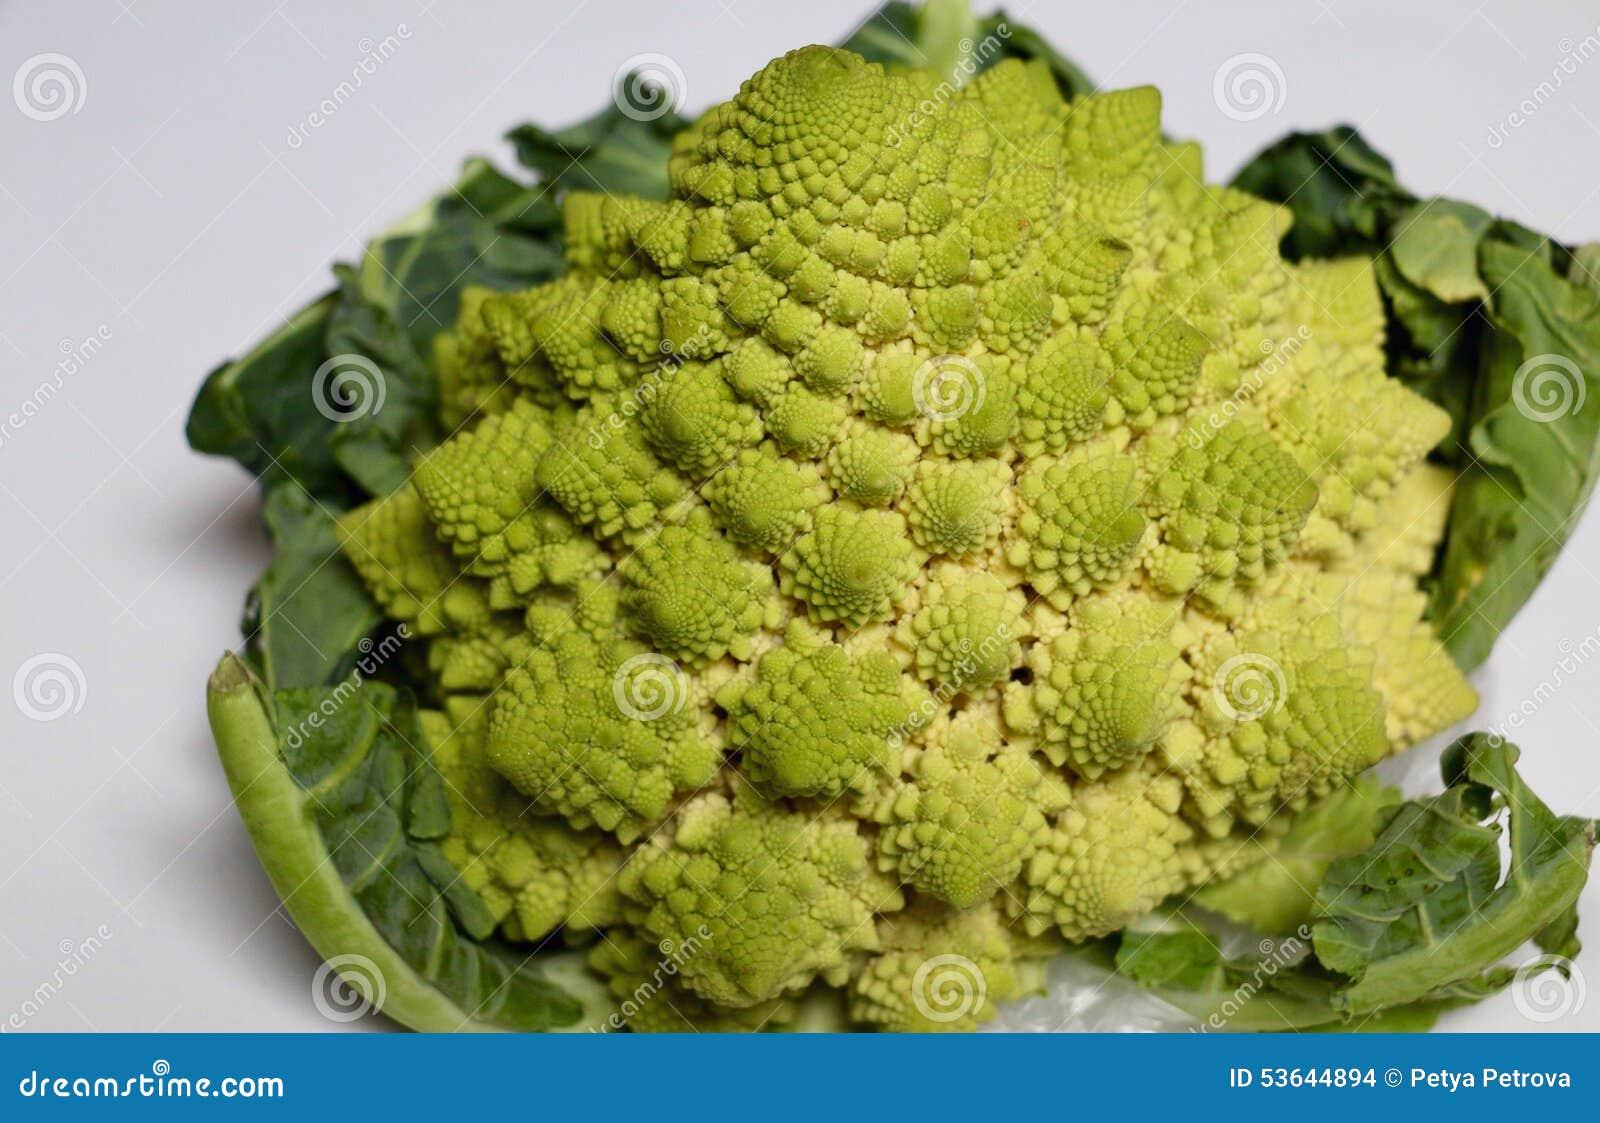 Cauliflower Romanesco Broccoli Plant Stock Photo Image Of